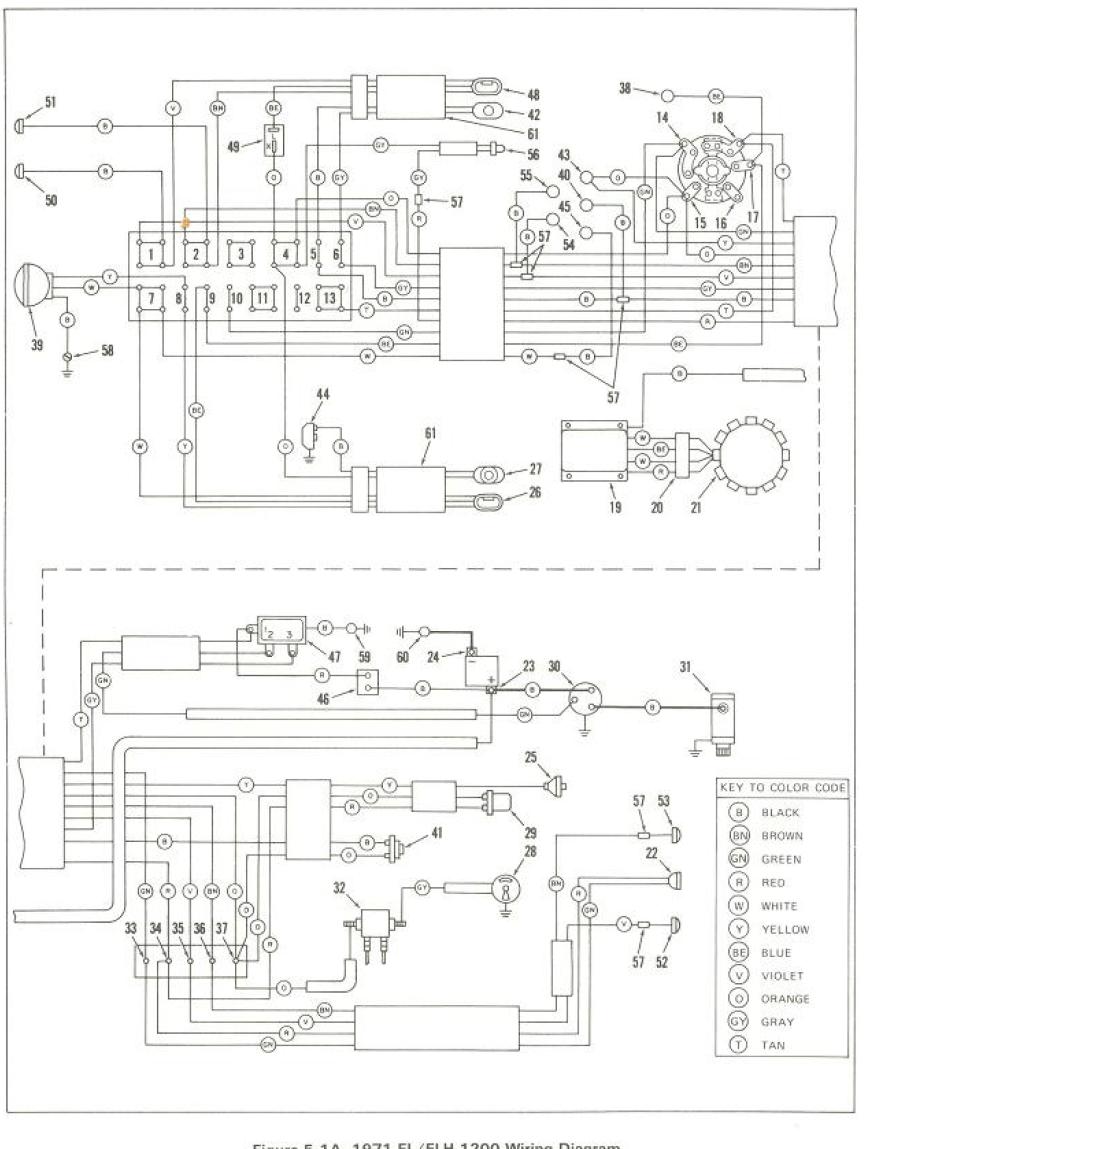 82 harley davidson sportster wiring diagram - Diagrams online on